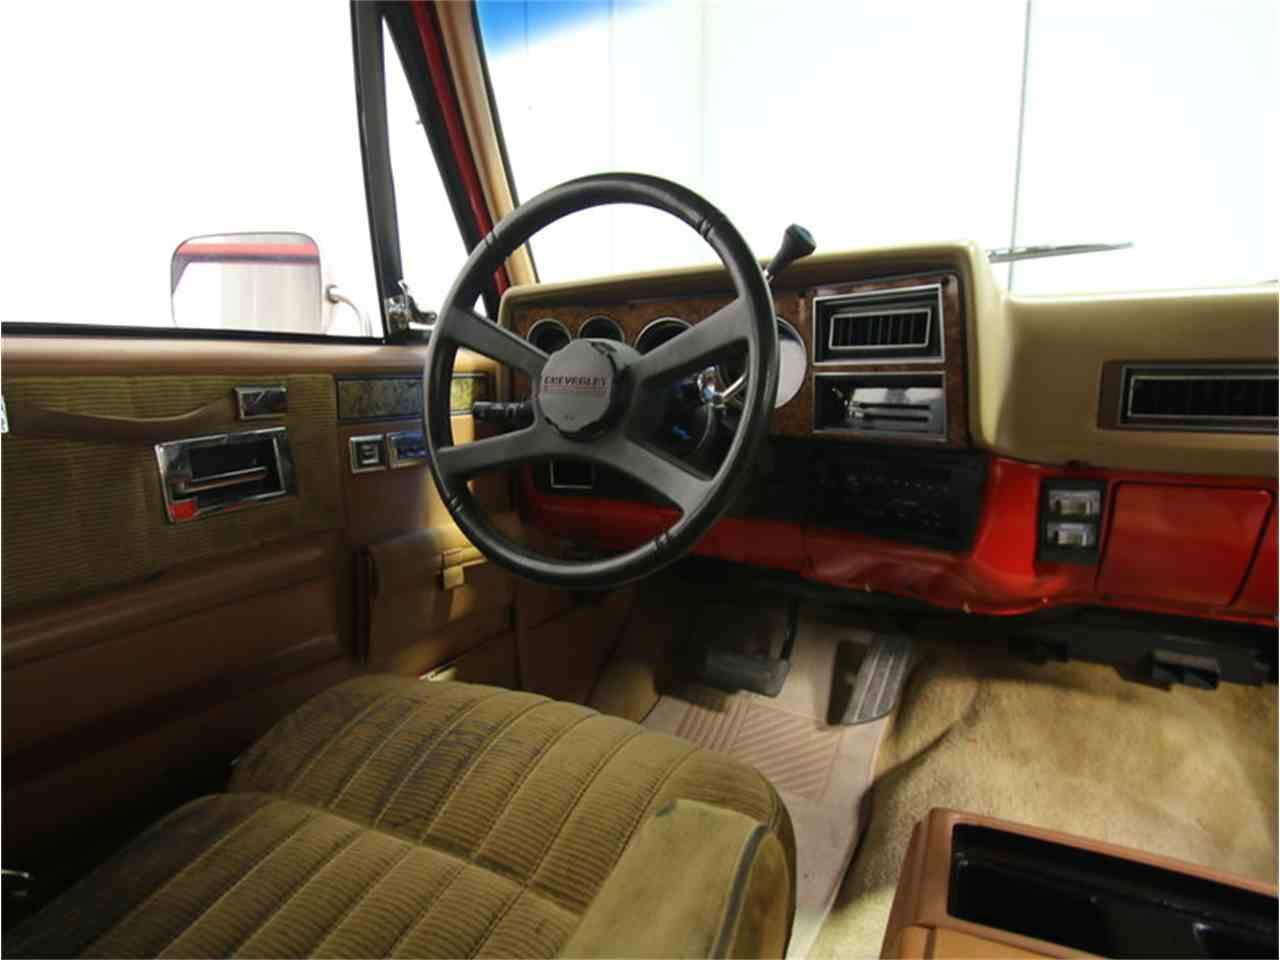 Large Picture of 1985 Chevrolet Suburban located in Lithia Springs Georgia - $11,995.00 - KIU1